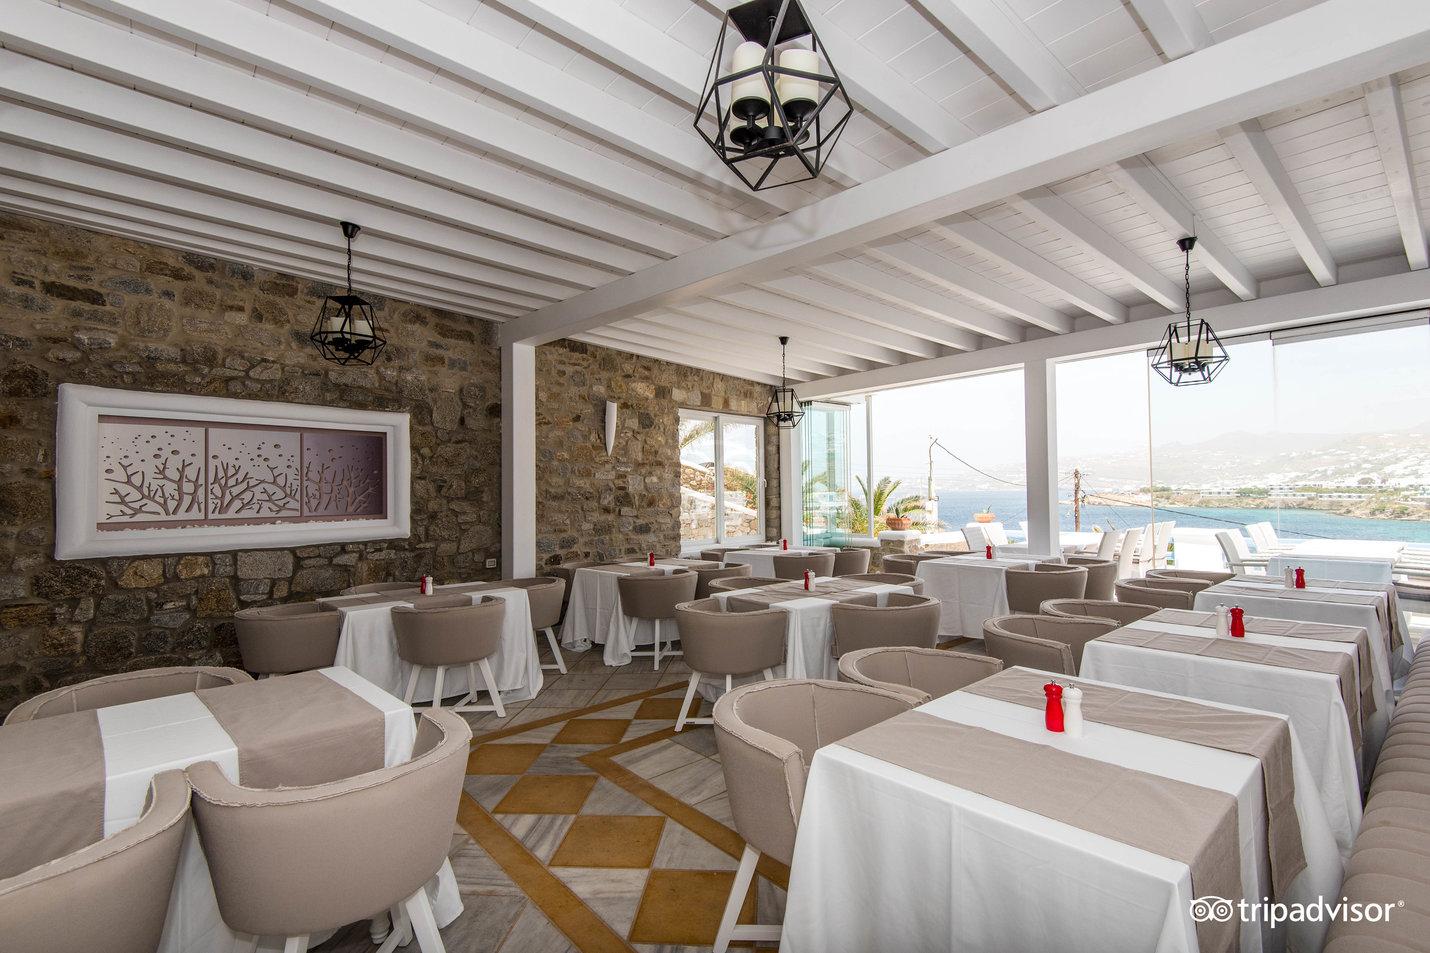 Orexis restaurant